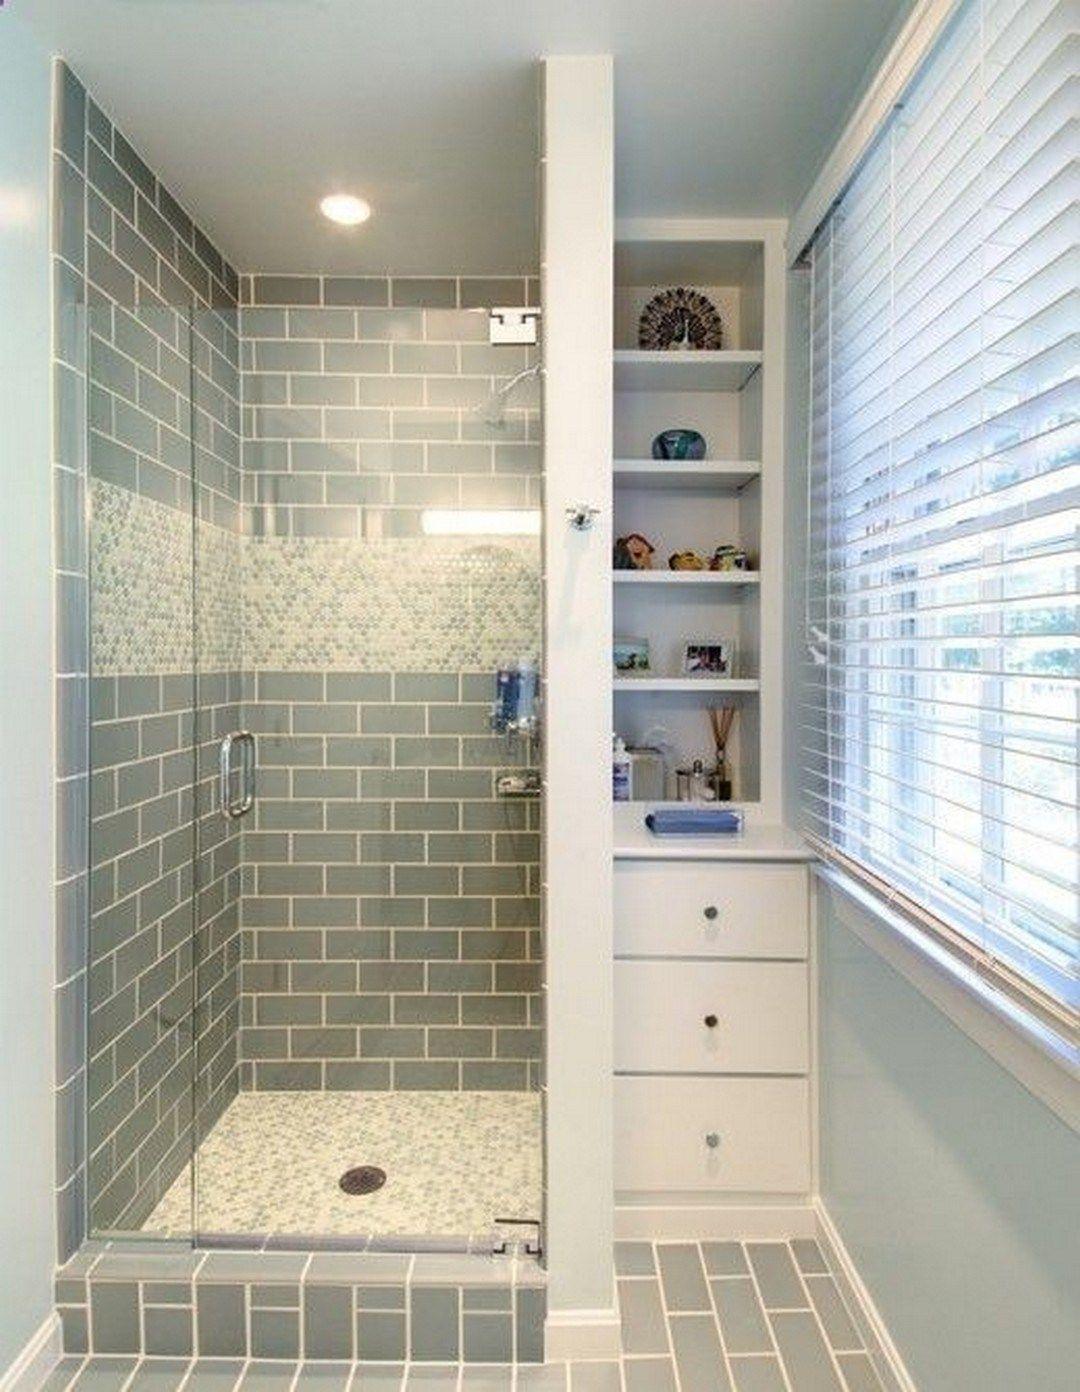 Salle De Bain Et Electricite ~ 99 Small Master Bathroom Makeover Ideas On A Budget 63 Bathroom